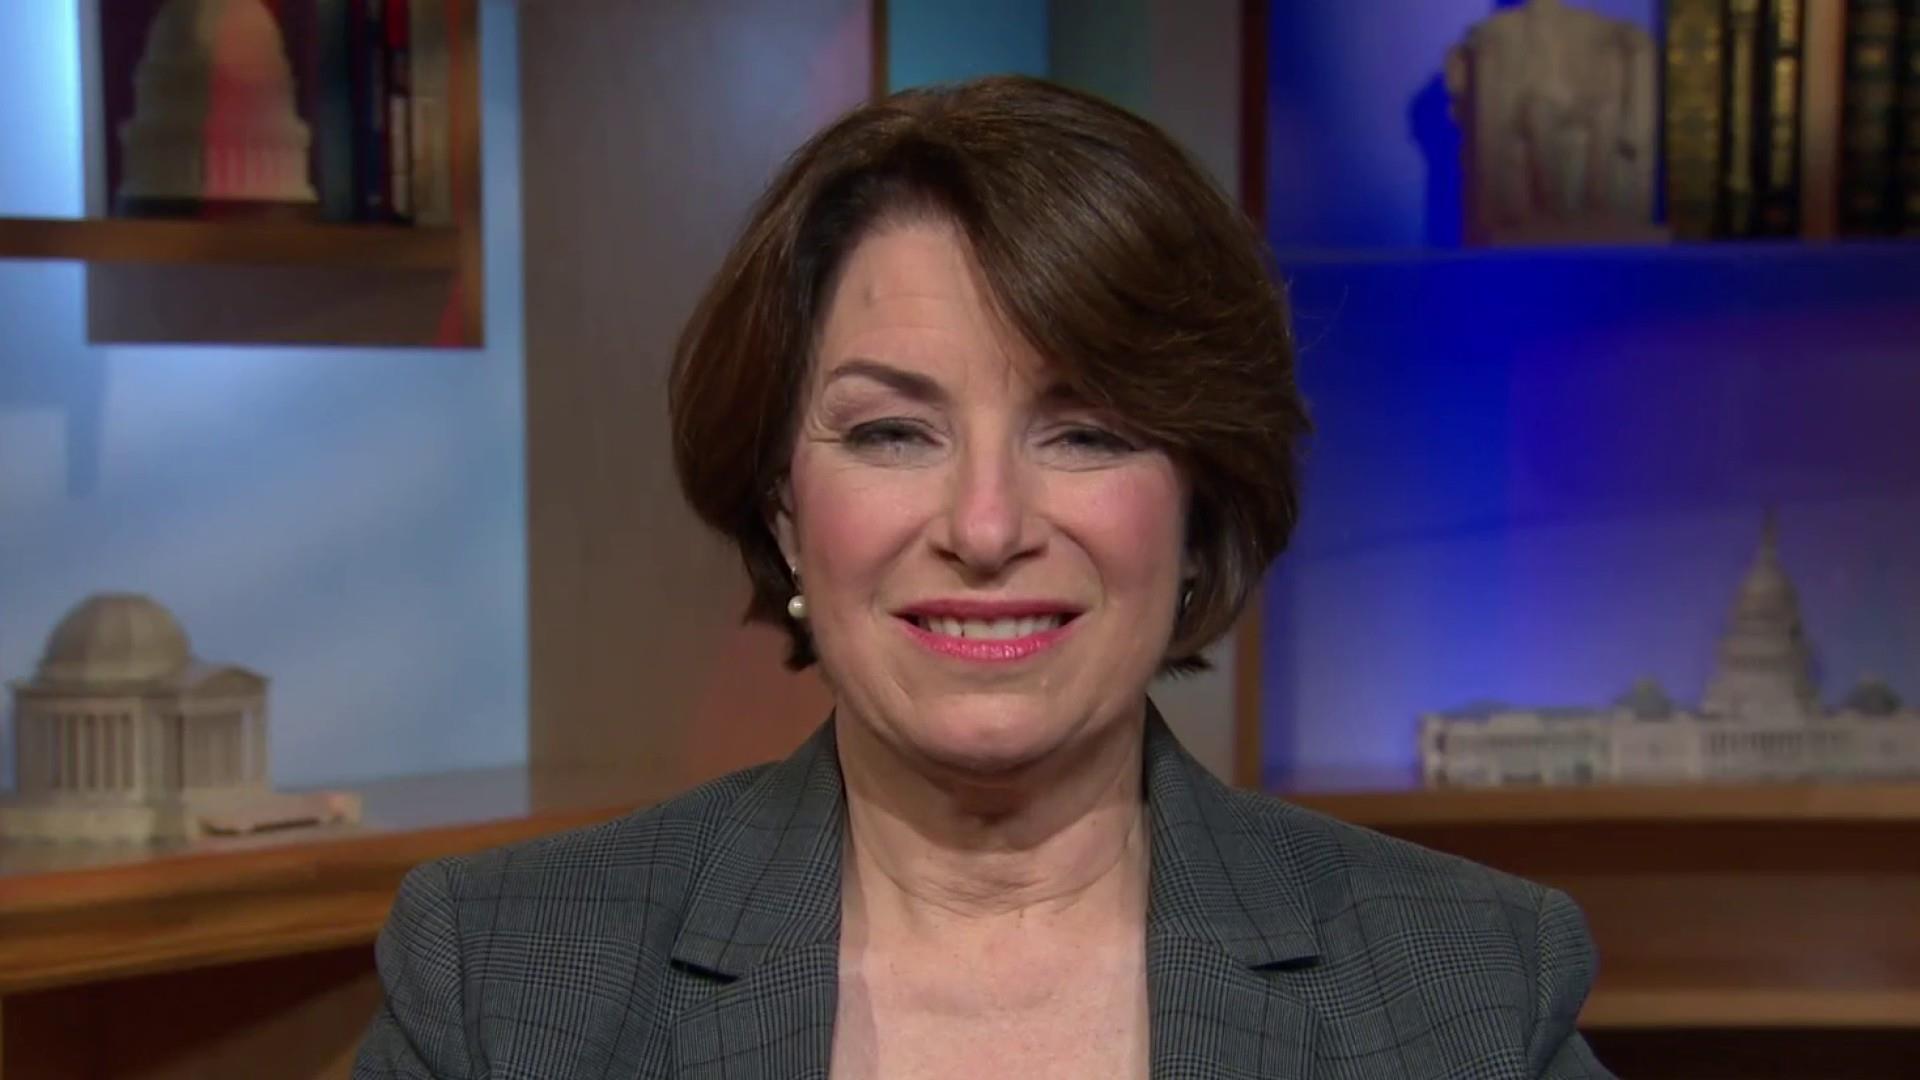 Sen. Klobuchar on shutdown: Workers shouldn't be pawns